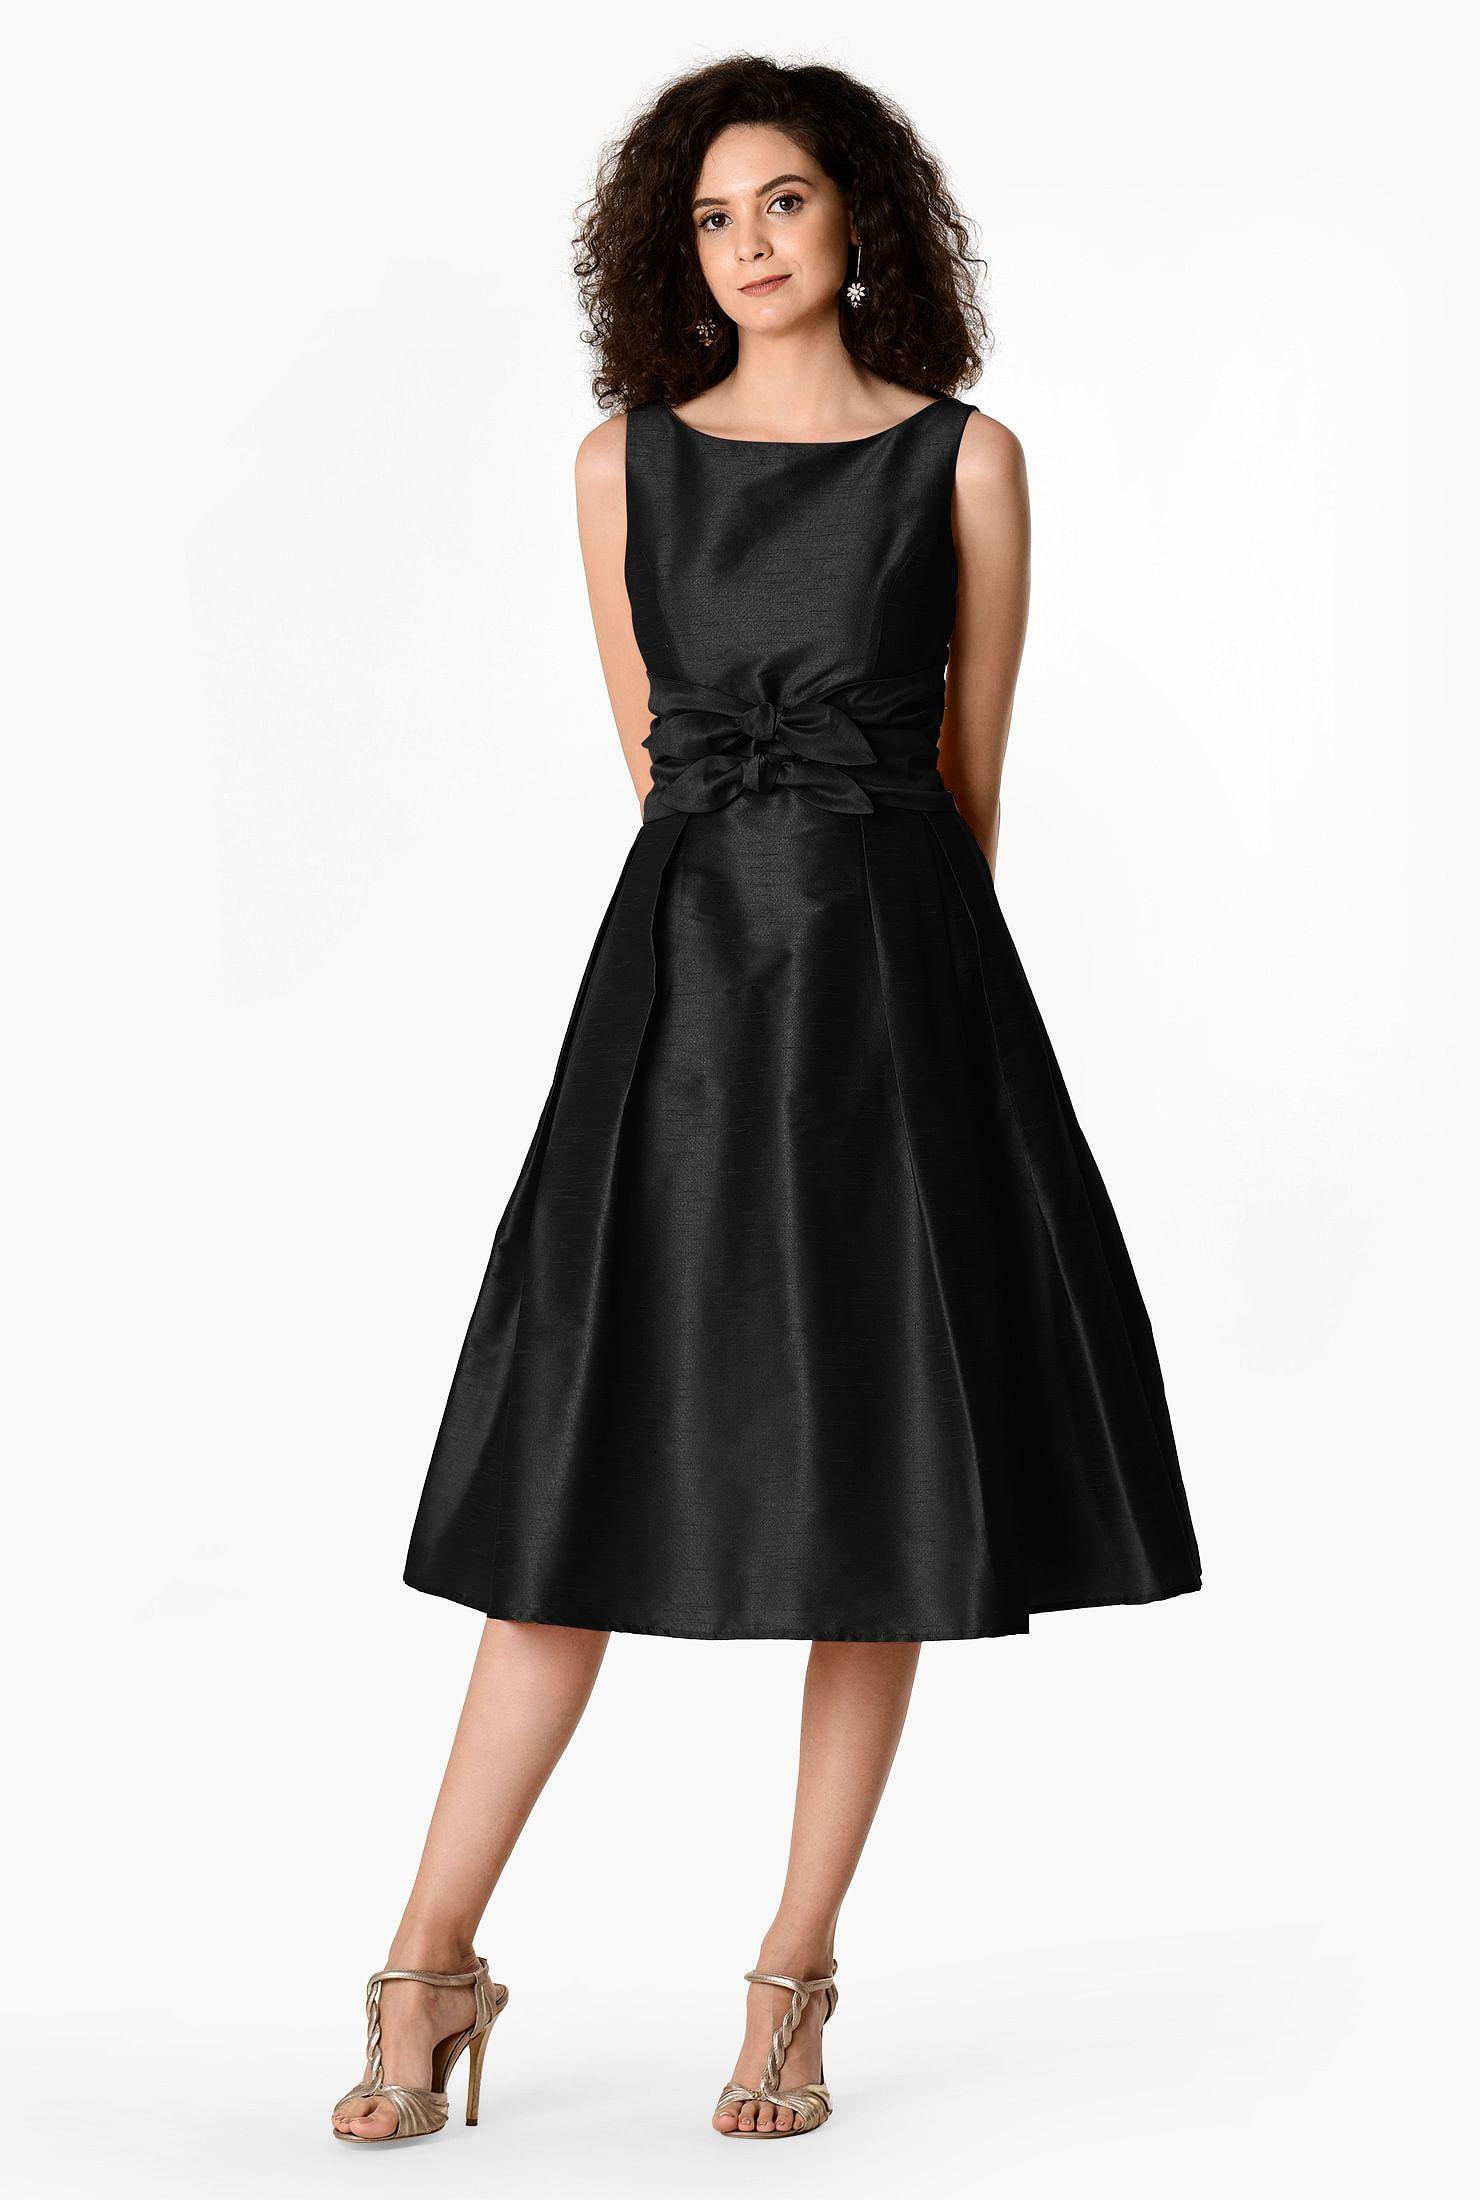 Bow-tie front dupioni dress